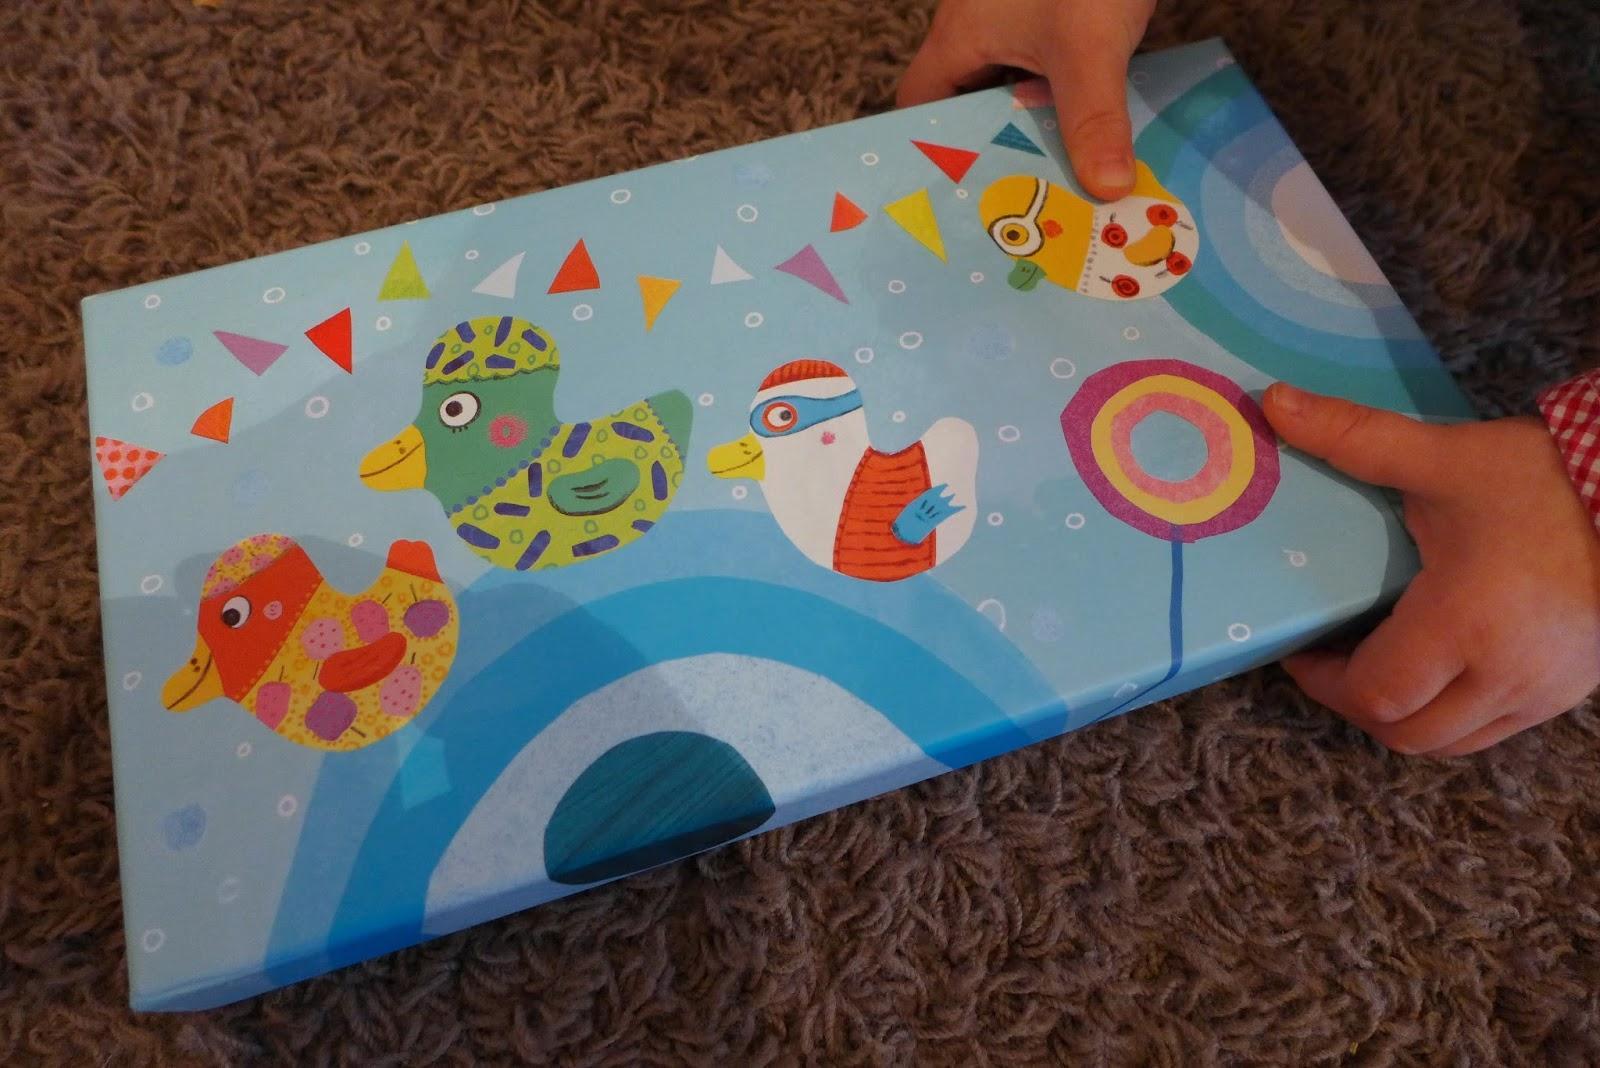 caprice et d lice kids geschenkideen f r 2 j hrige. Black Bedroom Furniture Sets. Home Design Ideas